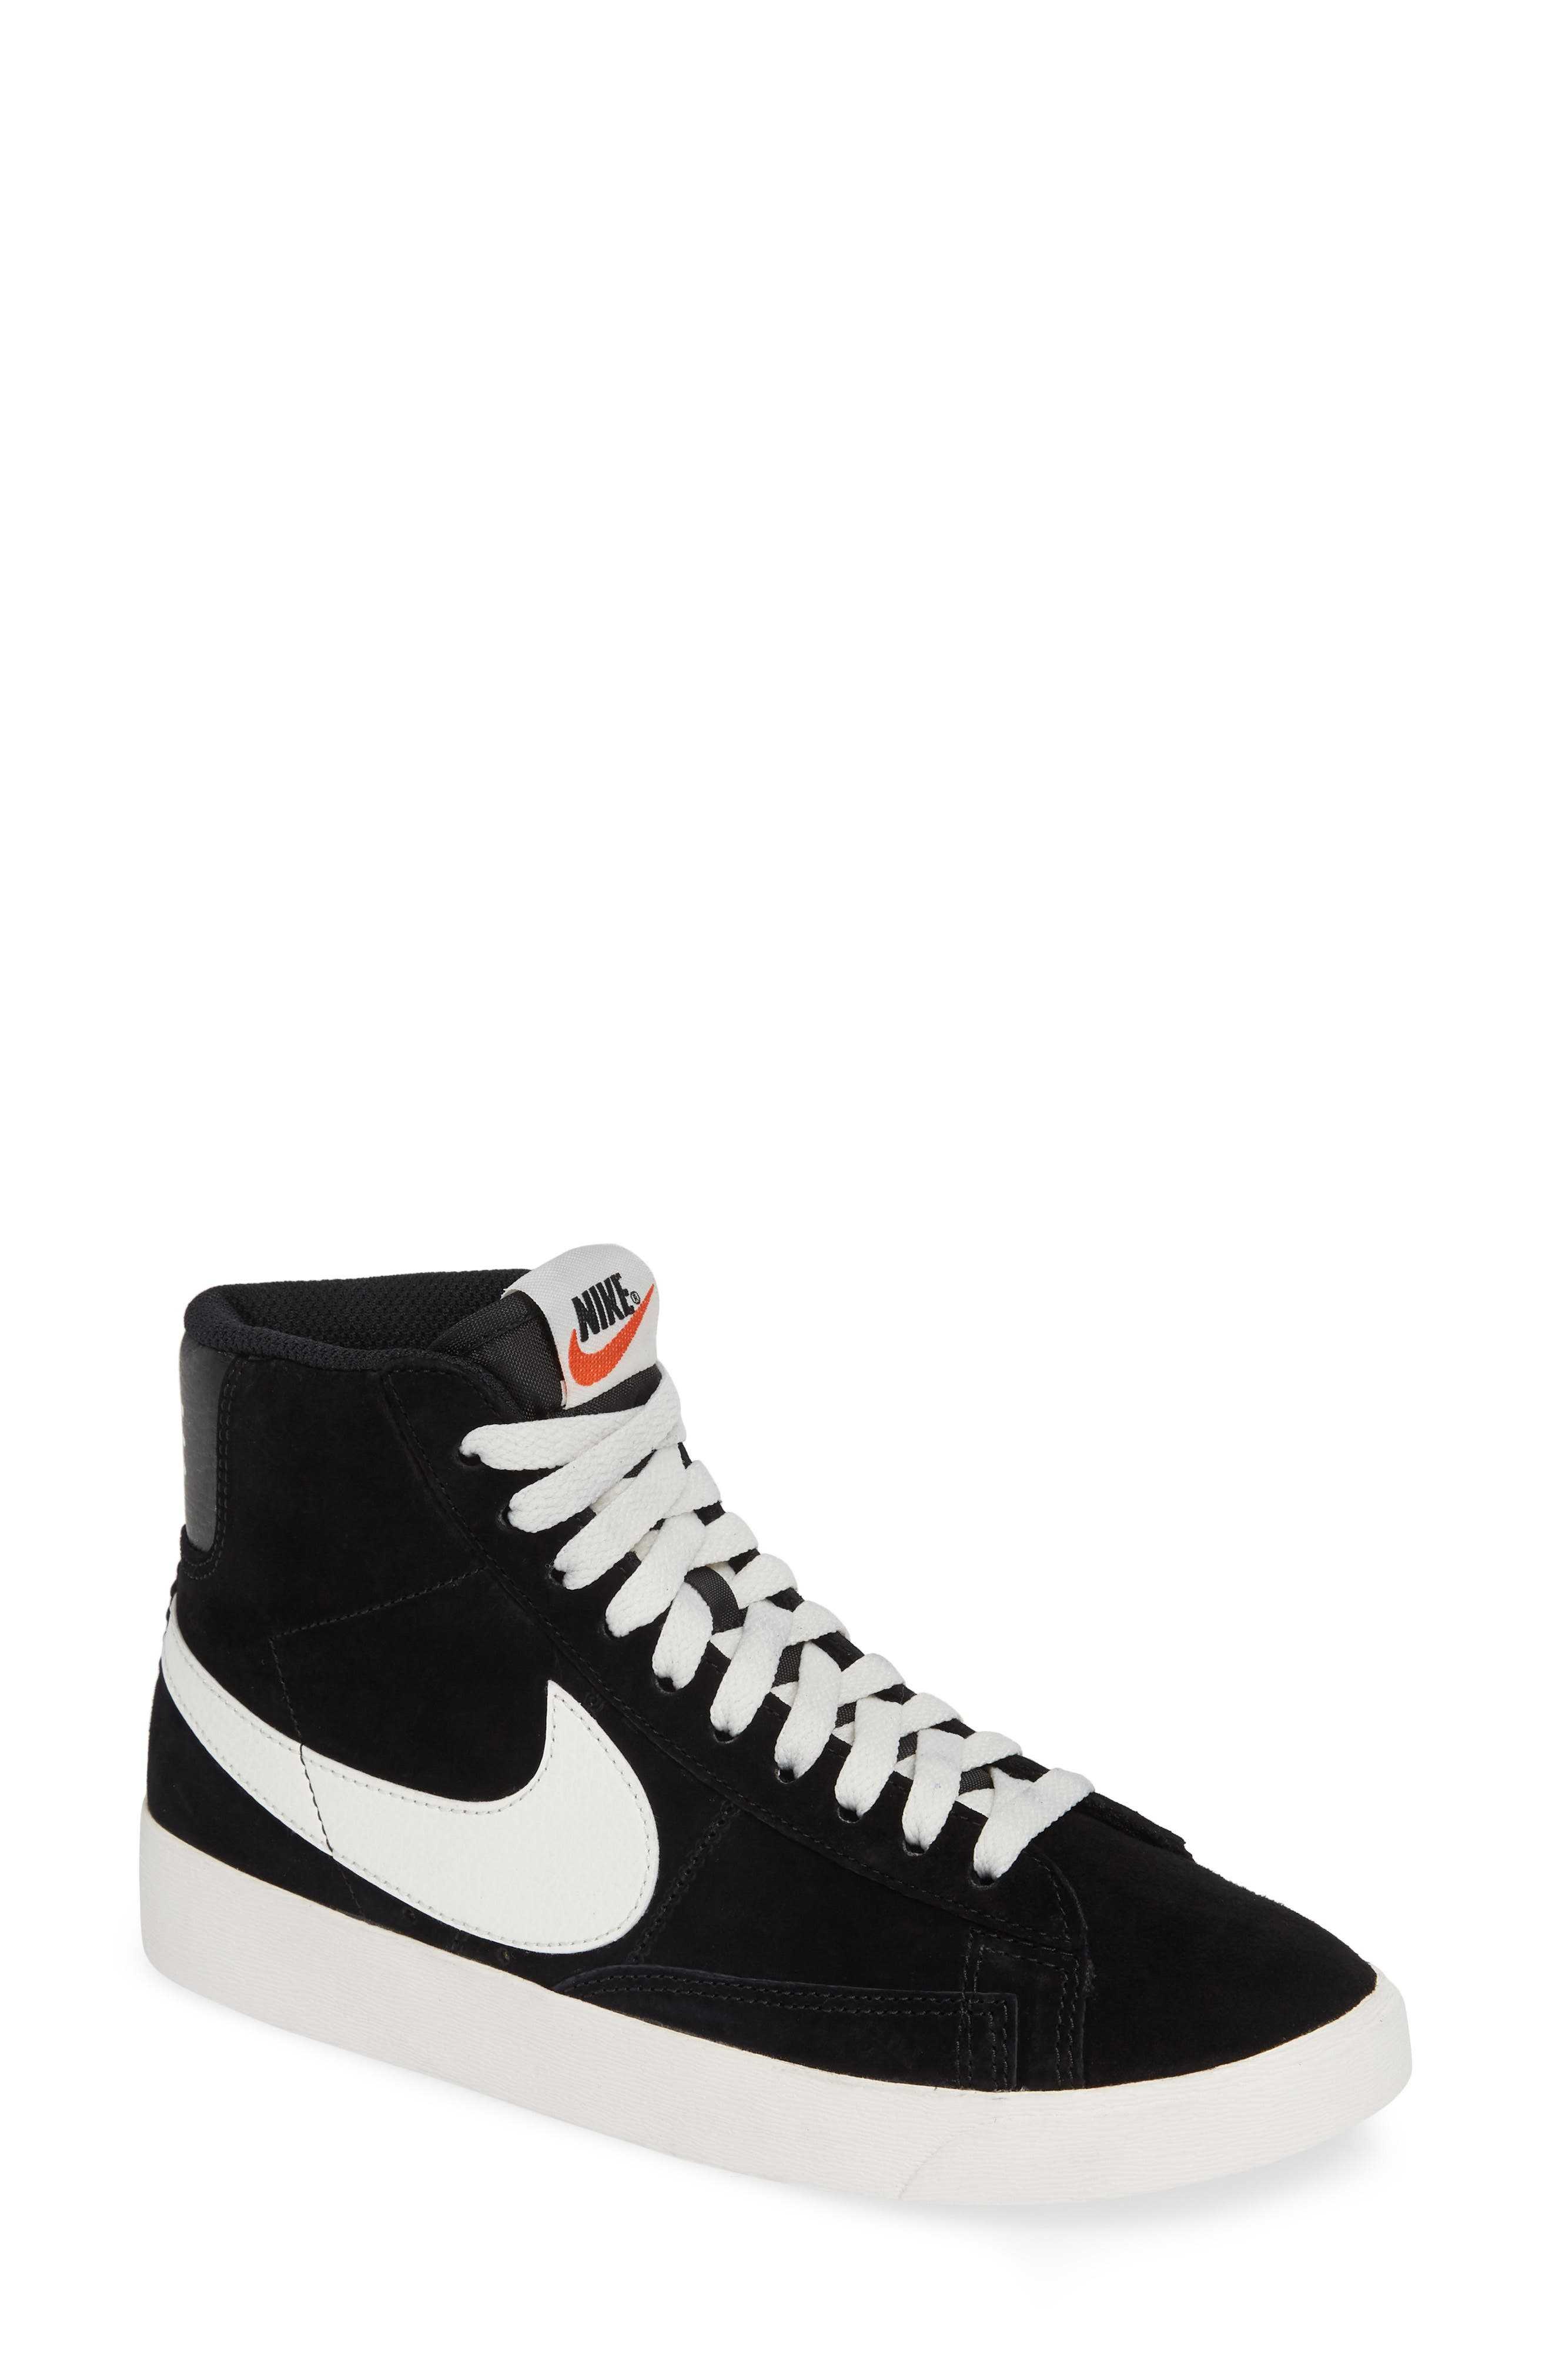 c4f2bcdda02d ... discount nike blazer mid vintage sneaker in black sail 5d44d 6d6ae